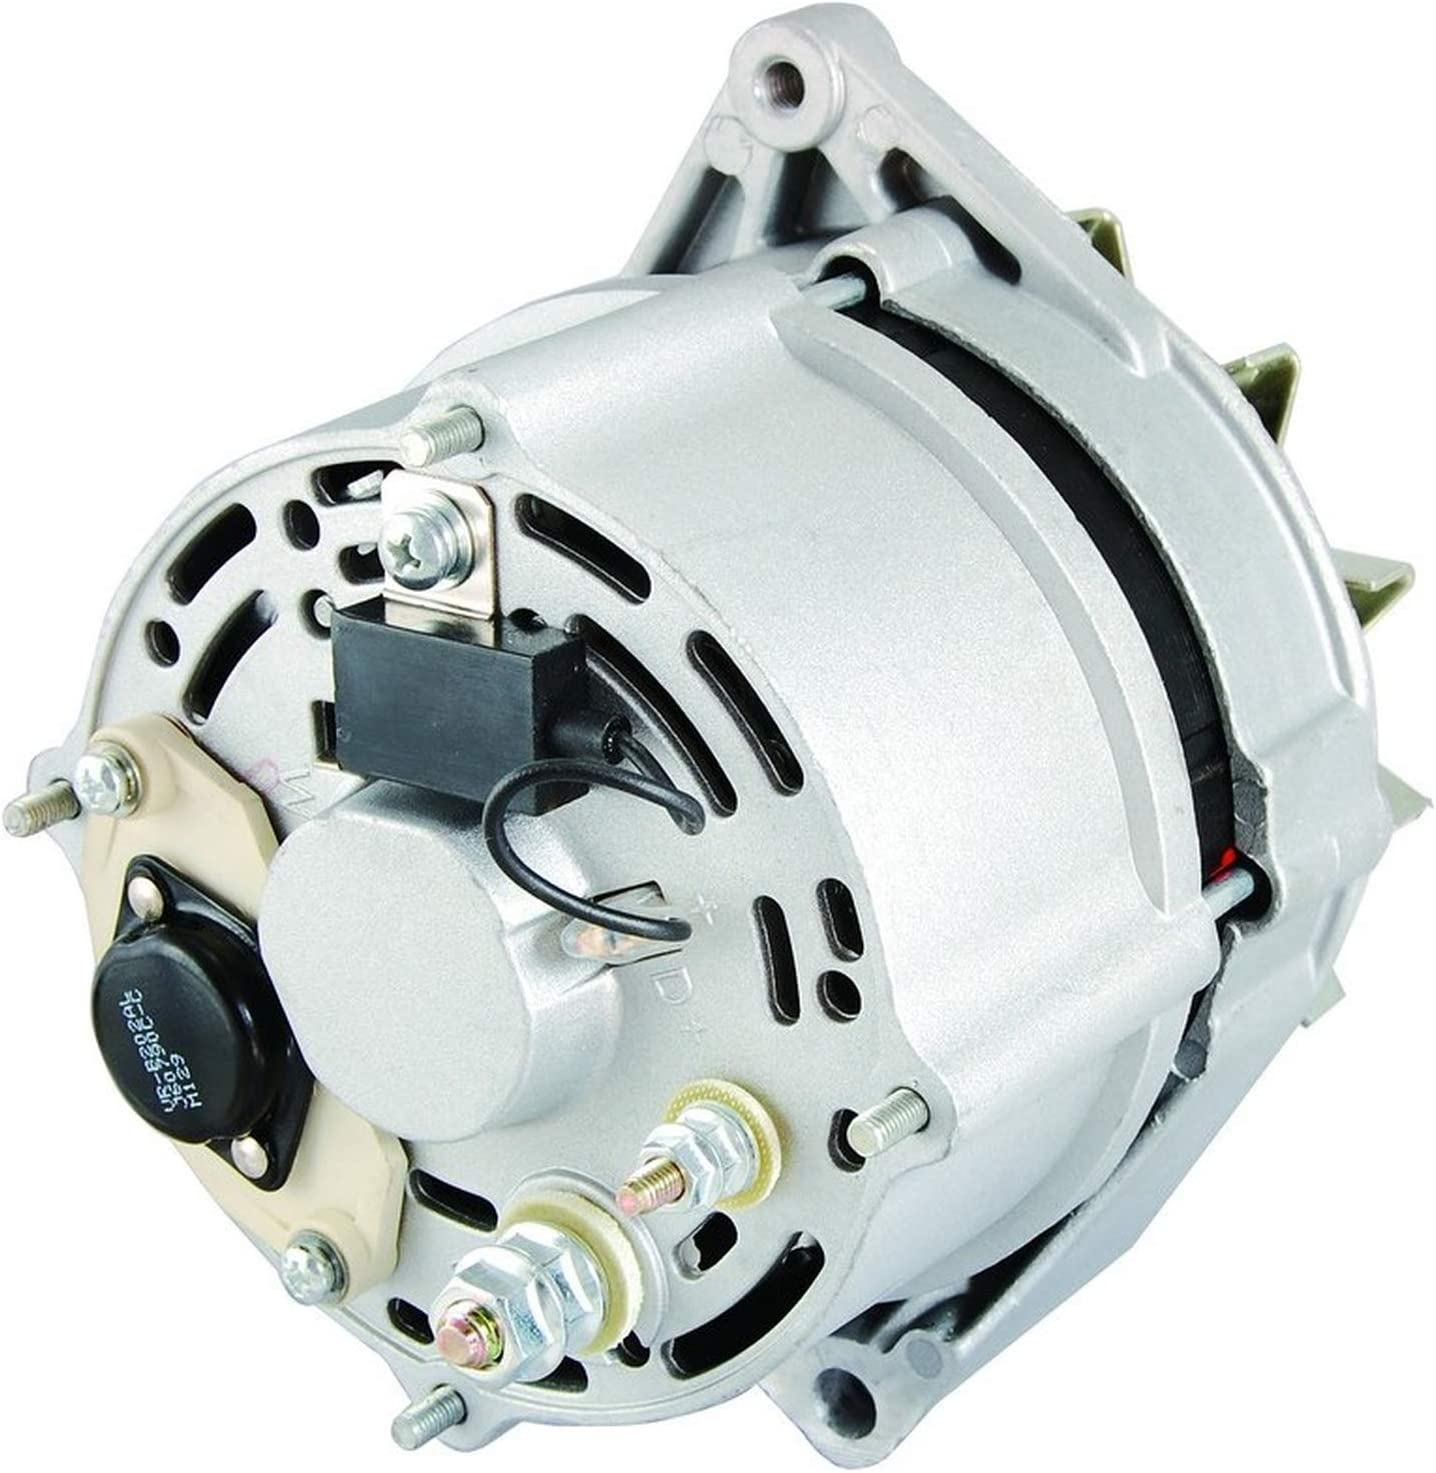 New Alternator Replacement For John 450H 450G Washington Mall 55% OFF Deere Crawler 400G